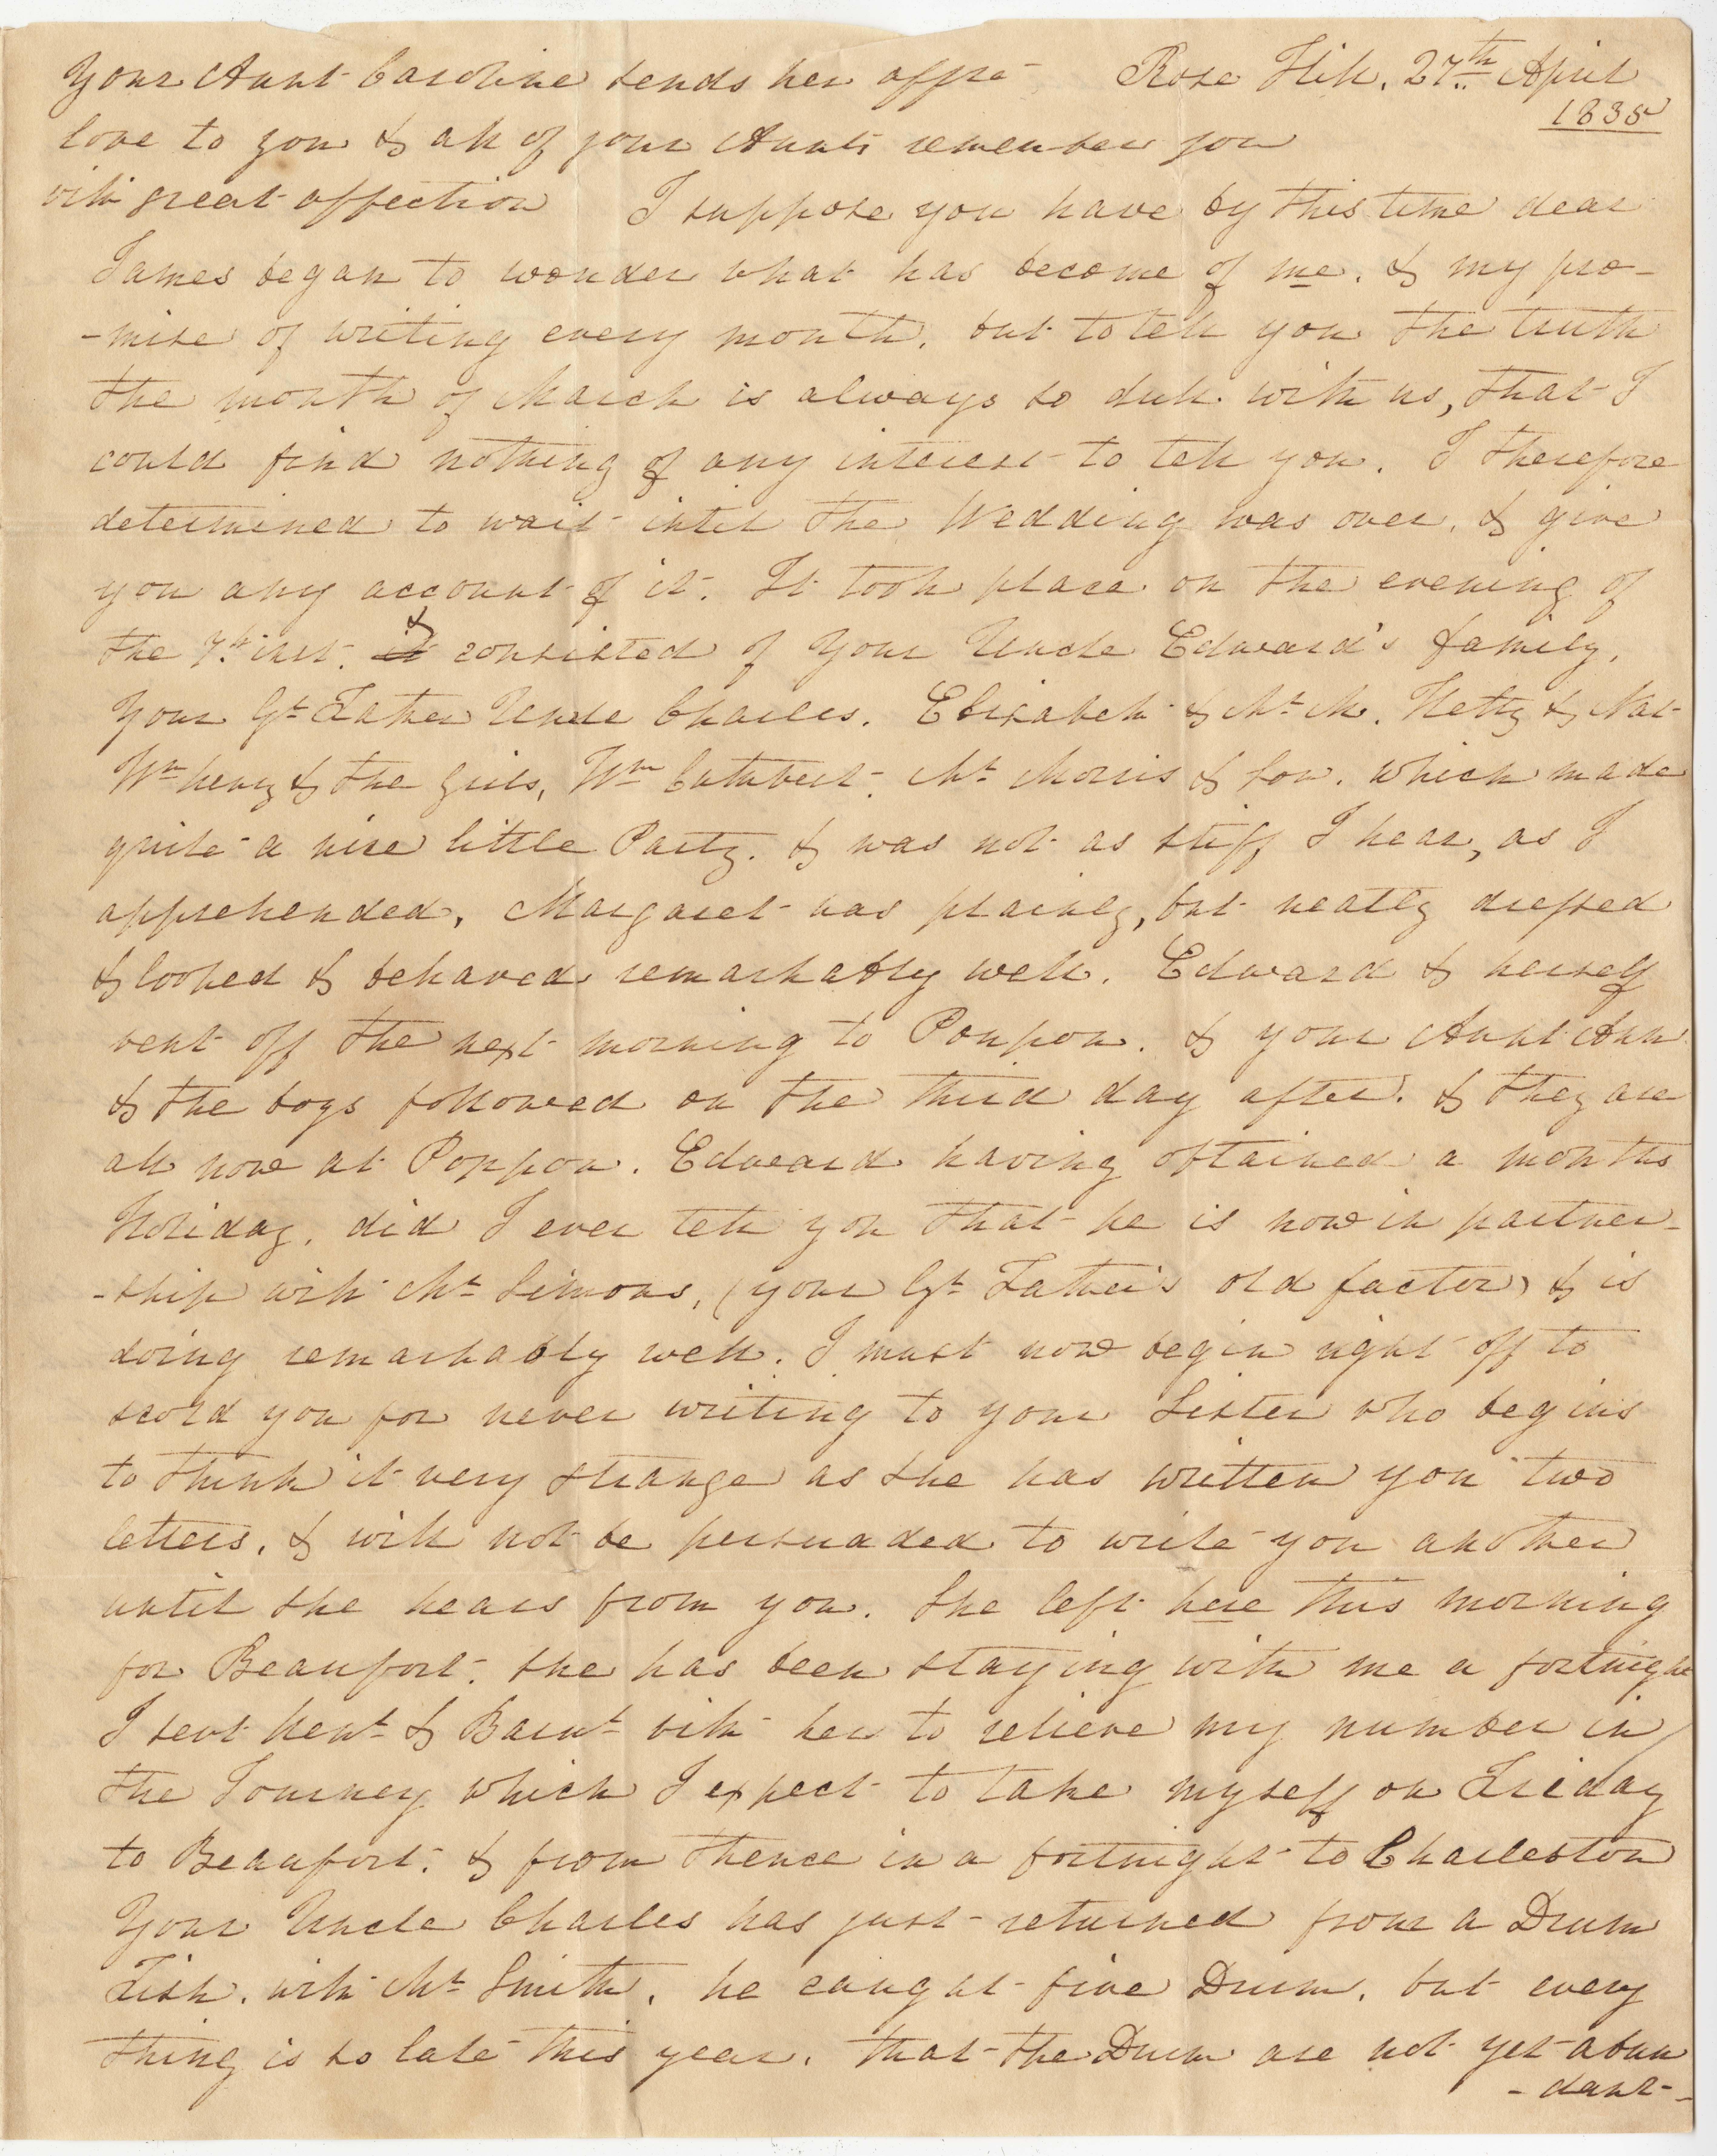 056. Letter to James B. Heyward -- April 27, 1835 (sender unknown)